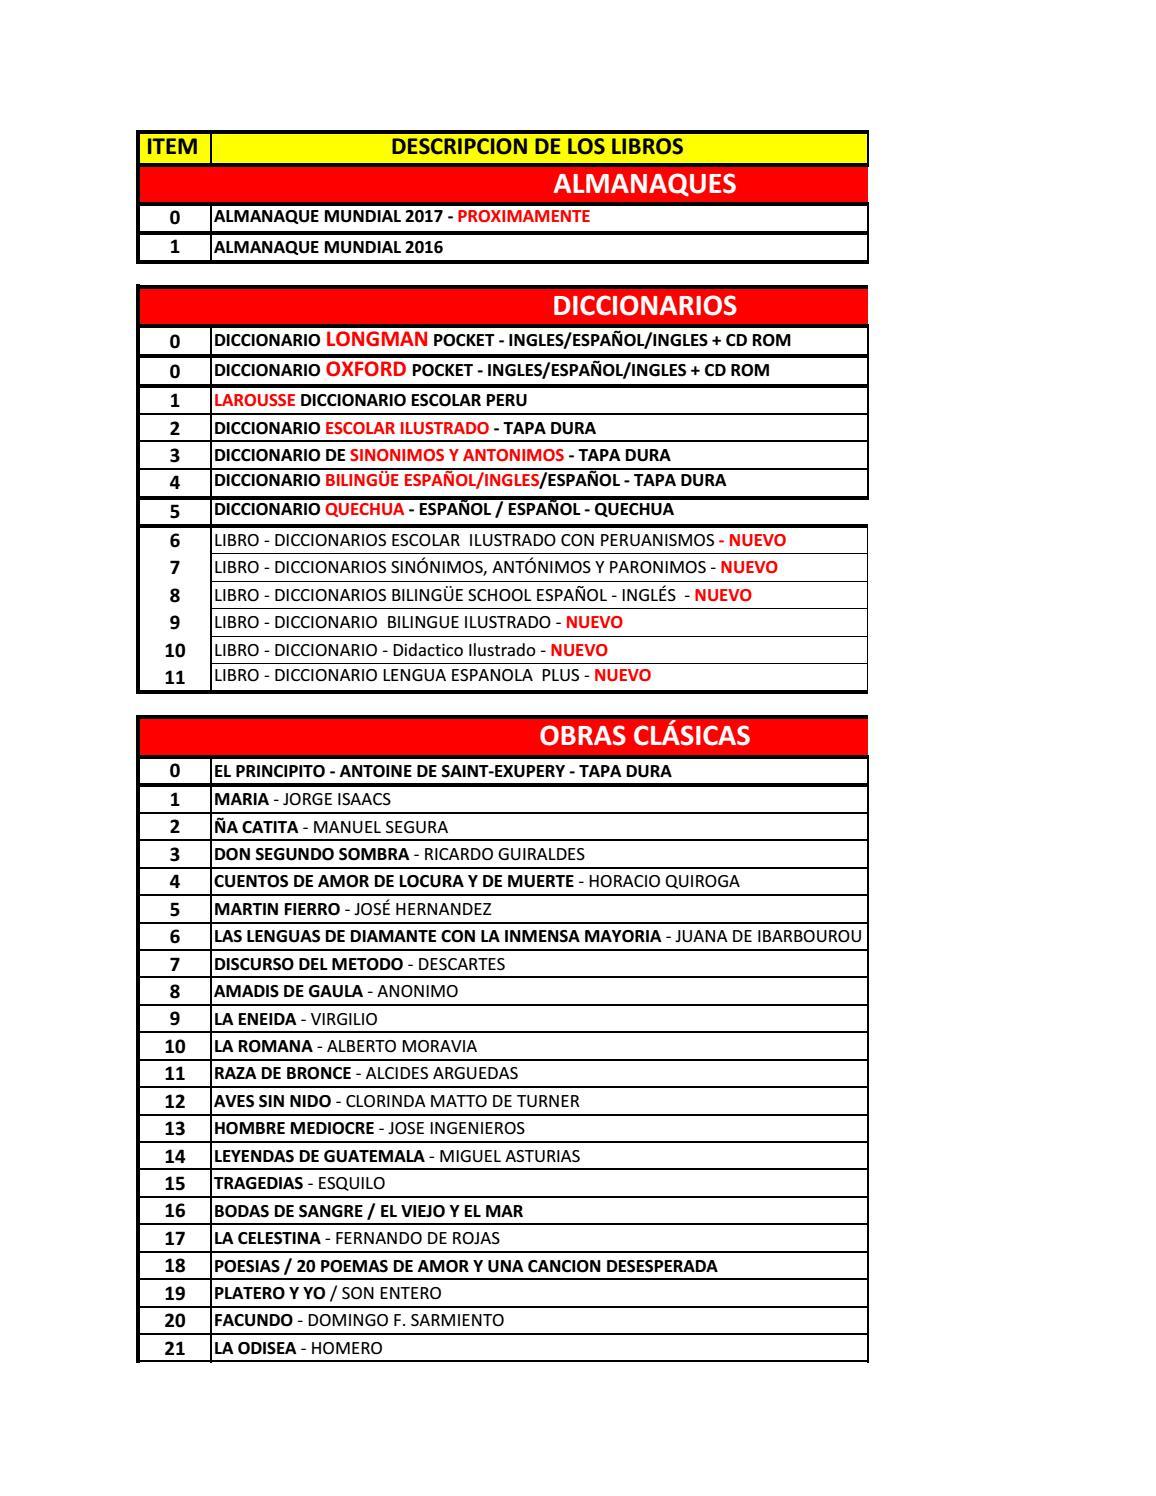 Lista general de precios guillermo stahl enero 2017 (m) by  www.stahlibrosdistribuidora.com - issuu b314ee86d7ca